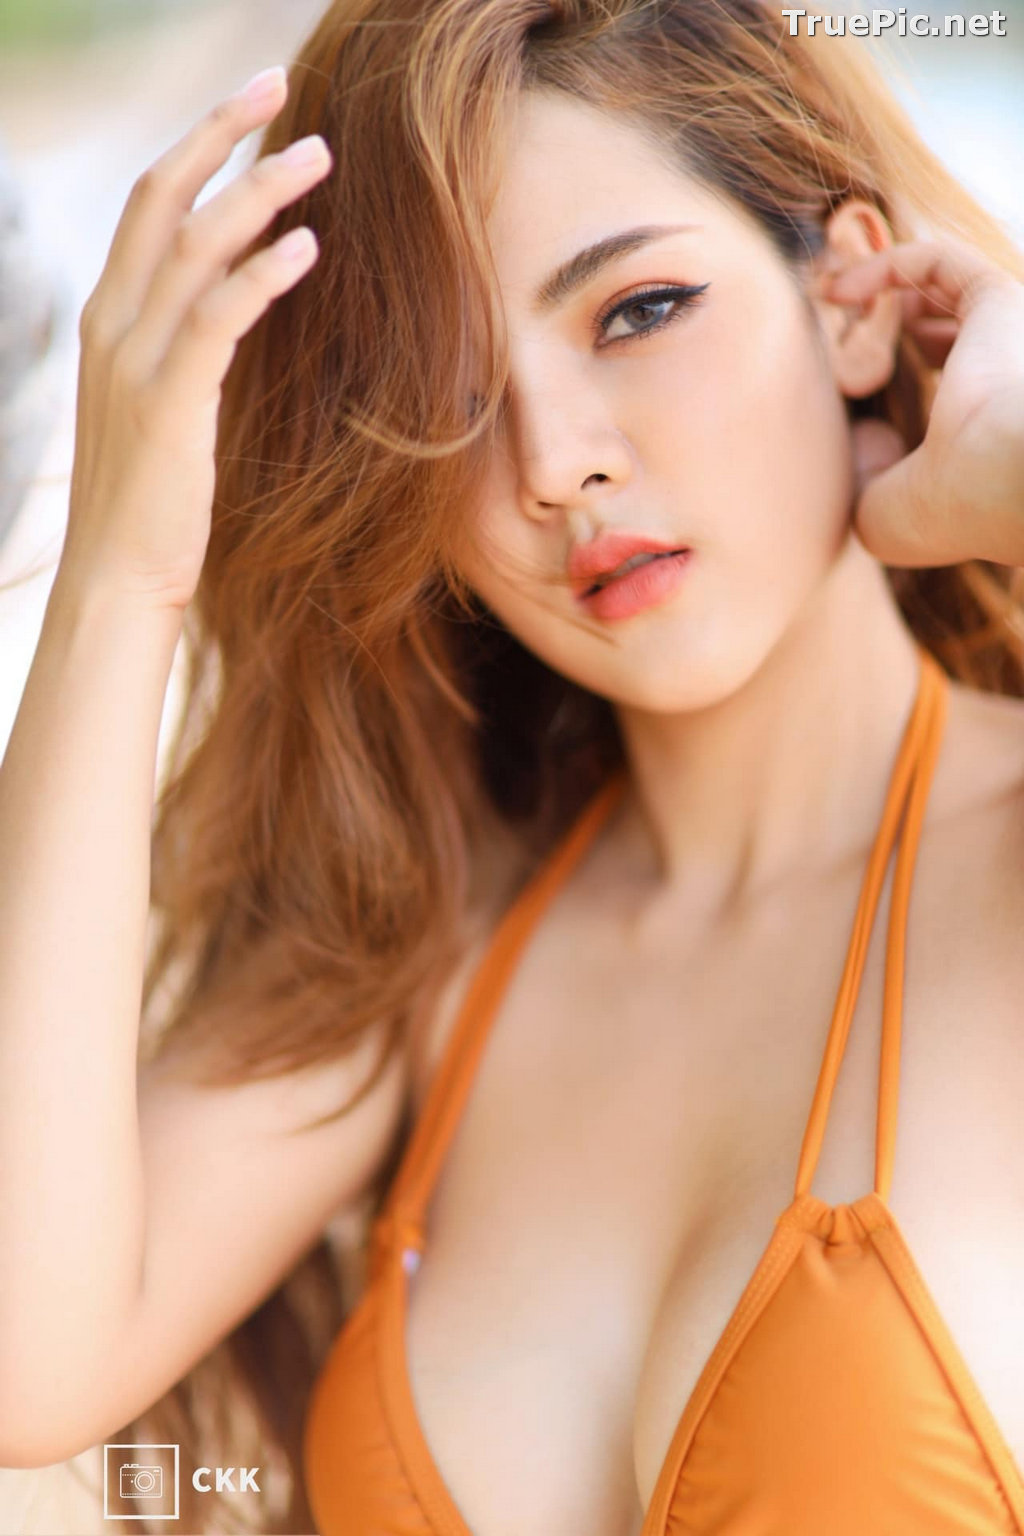 Image Thailand Model - Montakan Kaengraeng - Sexy Orange Bikini - TruePic.net - Picture-3